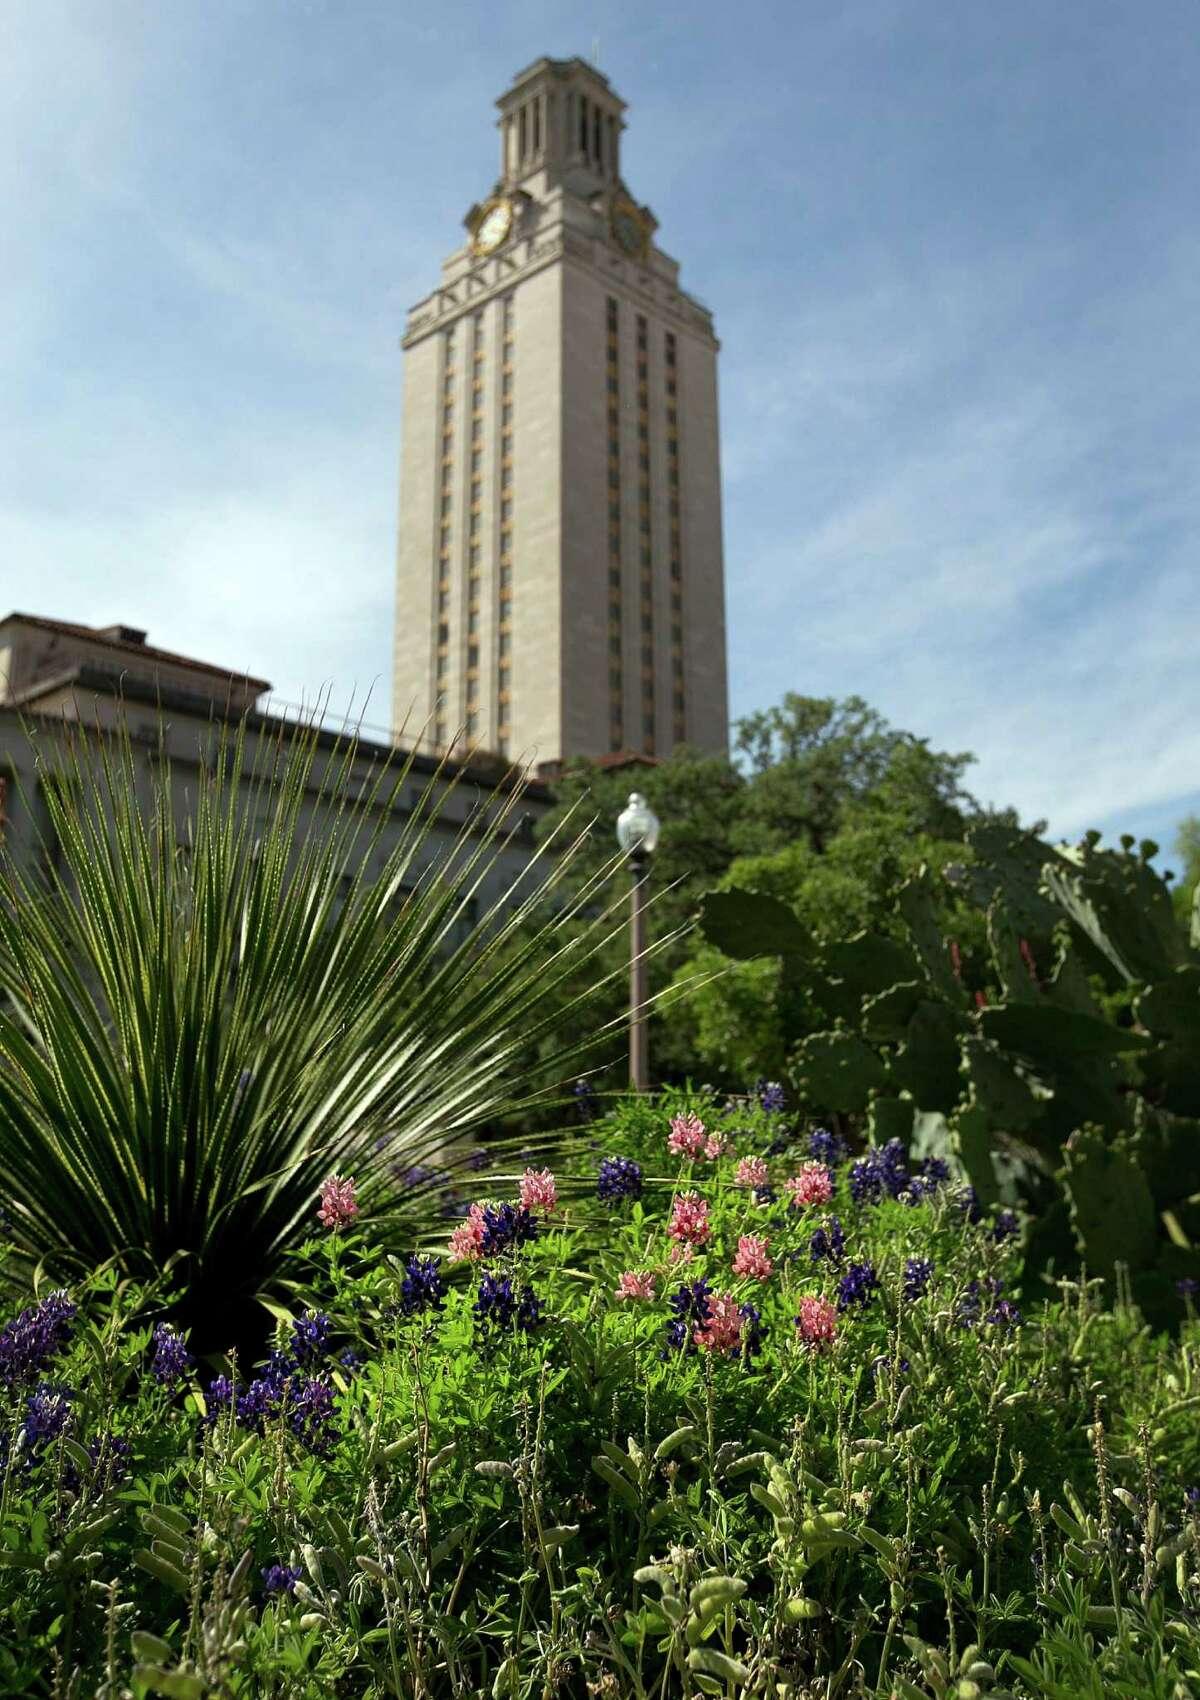 The University of Texas at Austin Rep. Robert Pittenger, R-Charlotte, NC; Rep. Blake Fahrenthold, R-Corpus Christi; Rep. Ruben Hinojosa, D-Mercedes; Rep. Lloyd Doggett, D-Austin